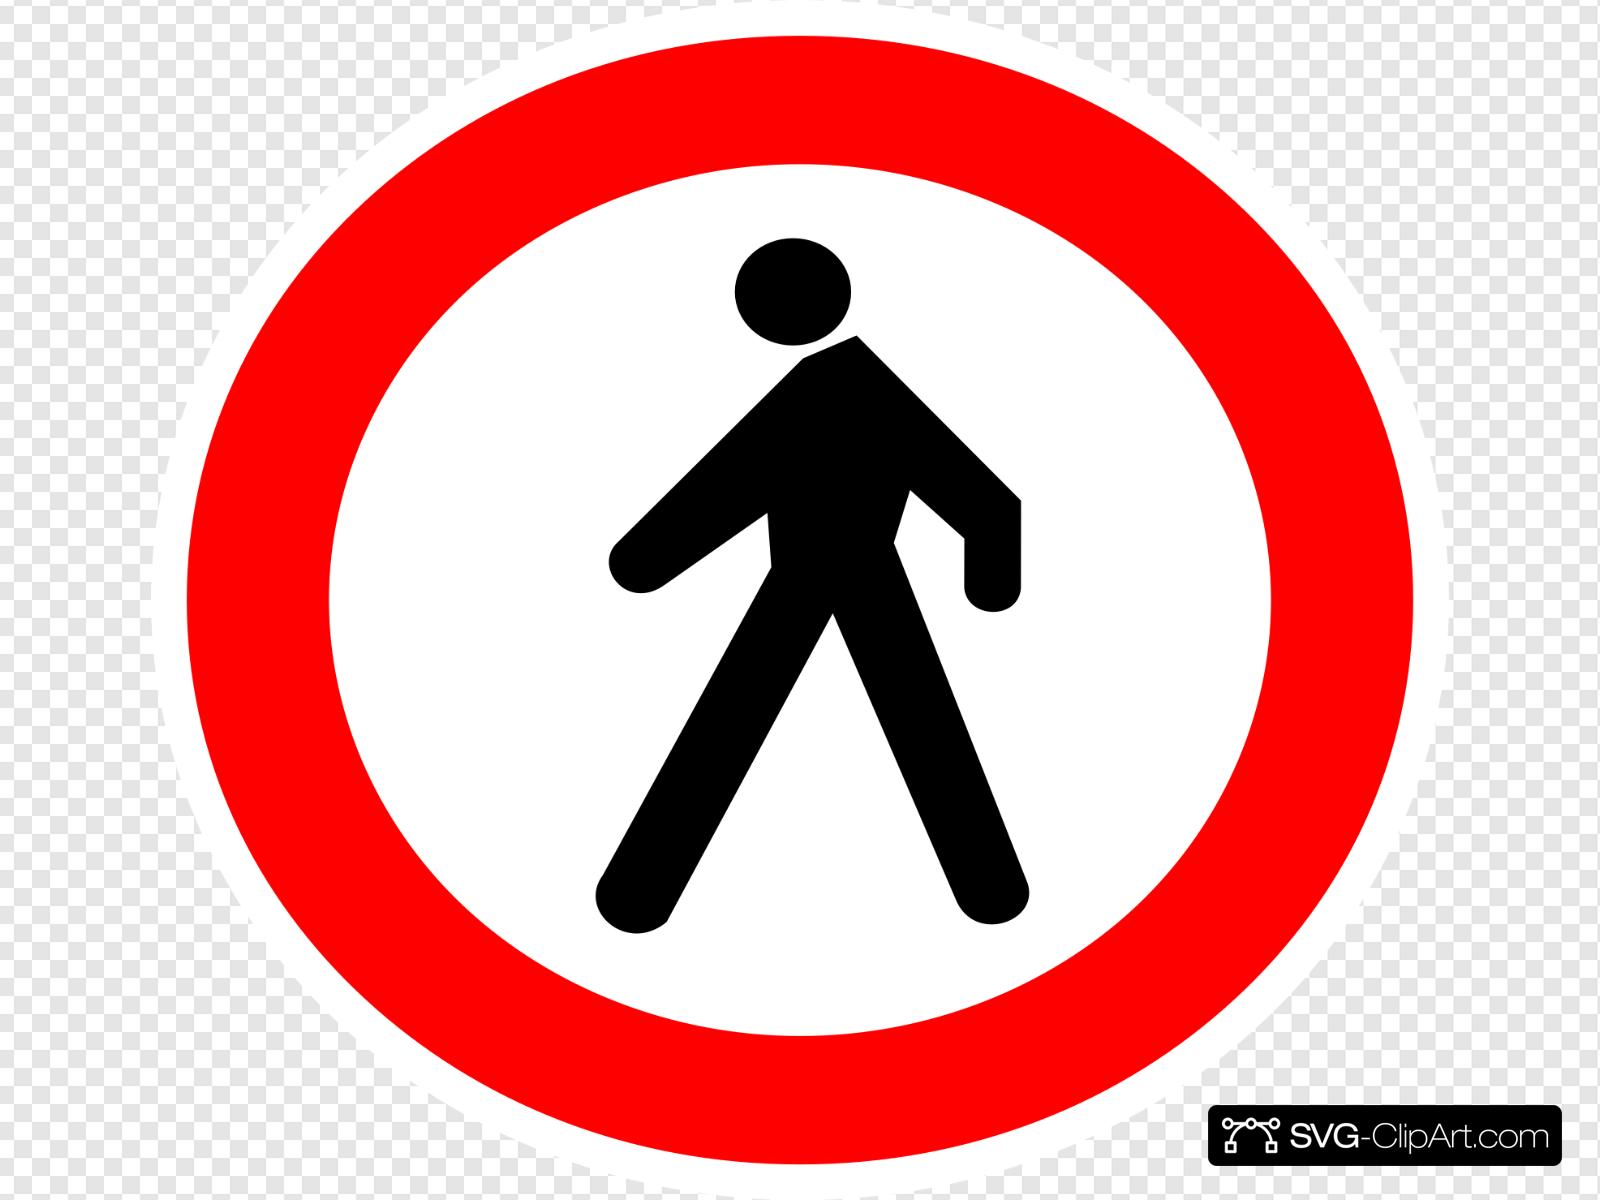 No Entrance Sign Clip art, Icon and SVG.